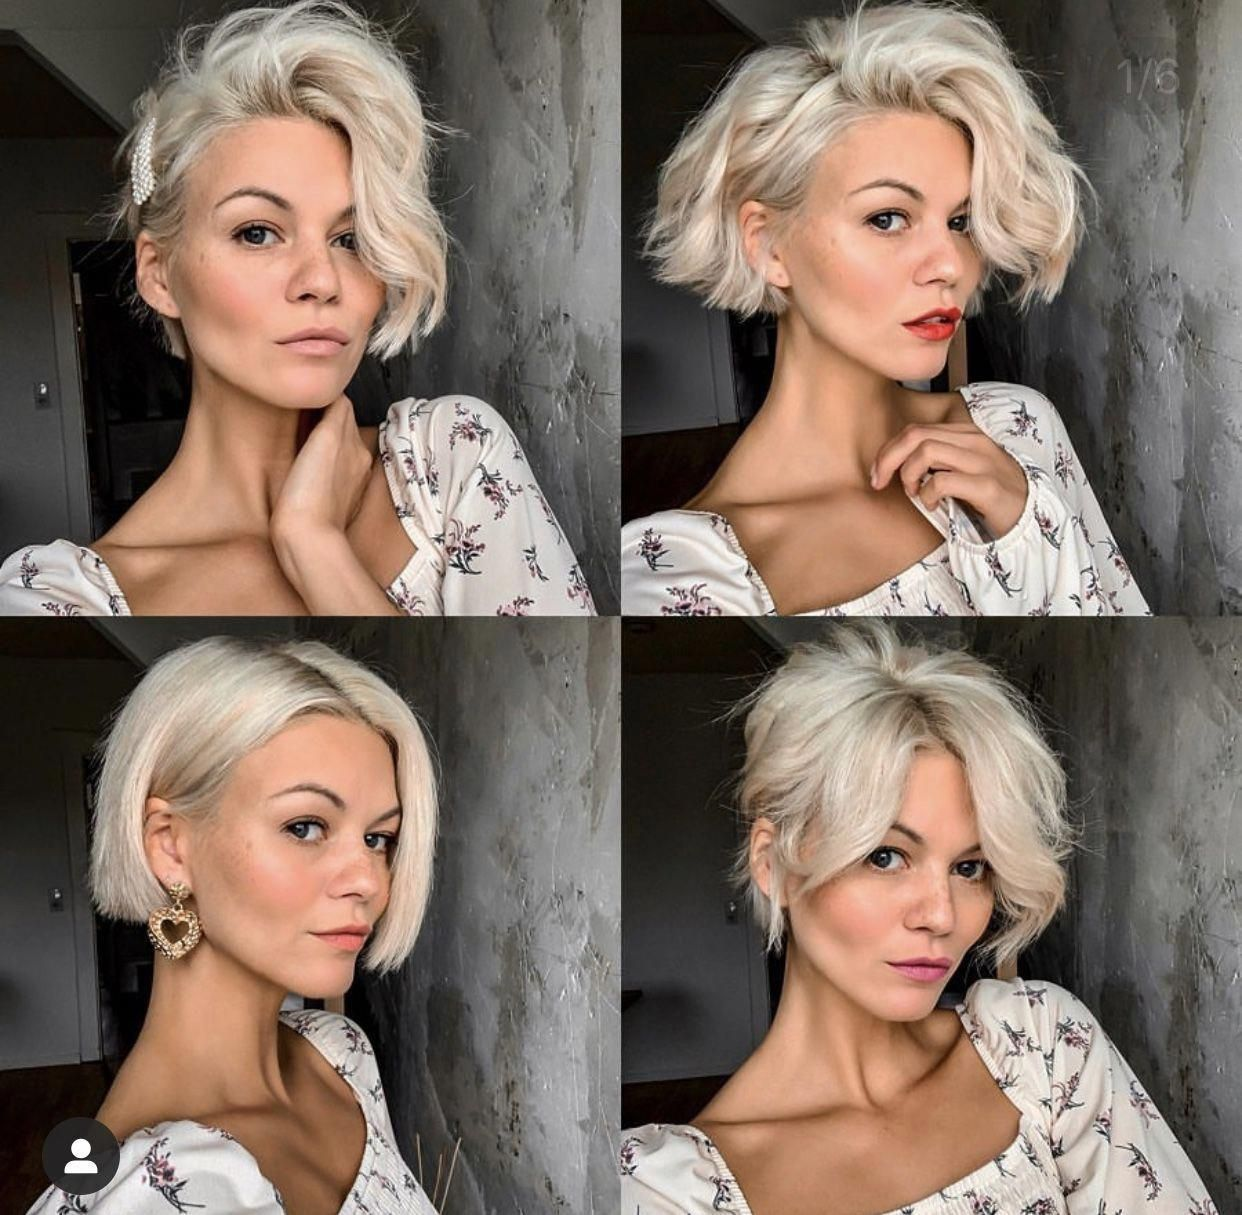 Epingle Par Hair Clips 90s Sur Annalynne Mccord Hair Coupe De Cheveux Cheveux Cheveux Courts Visage